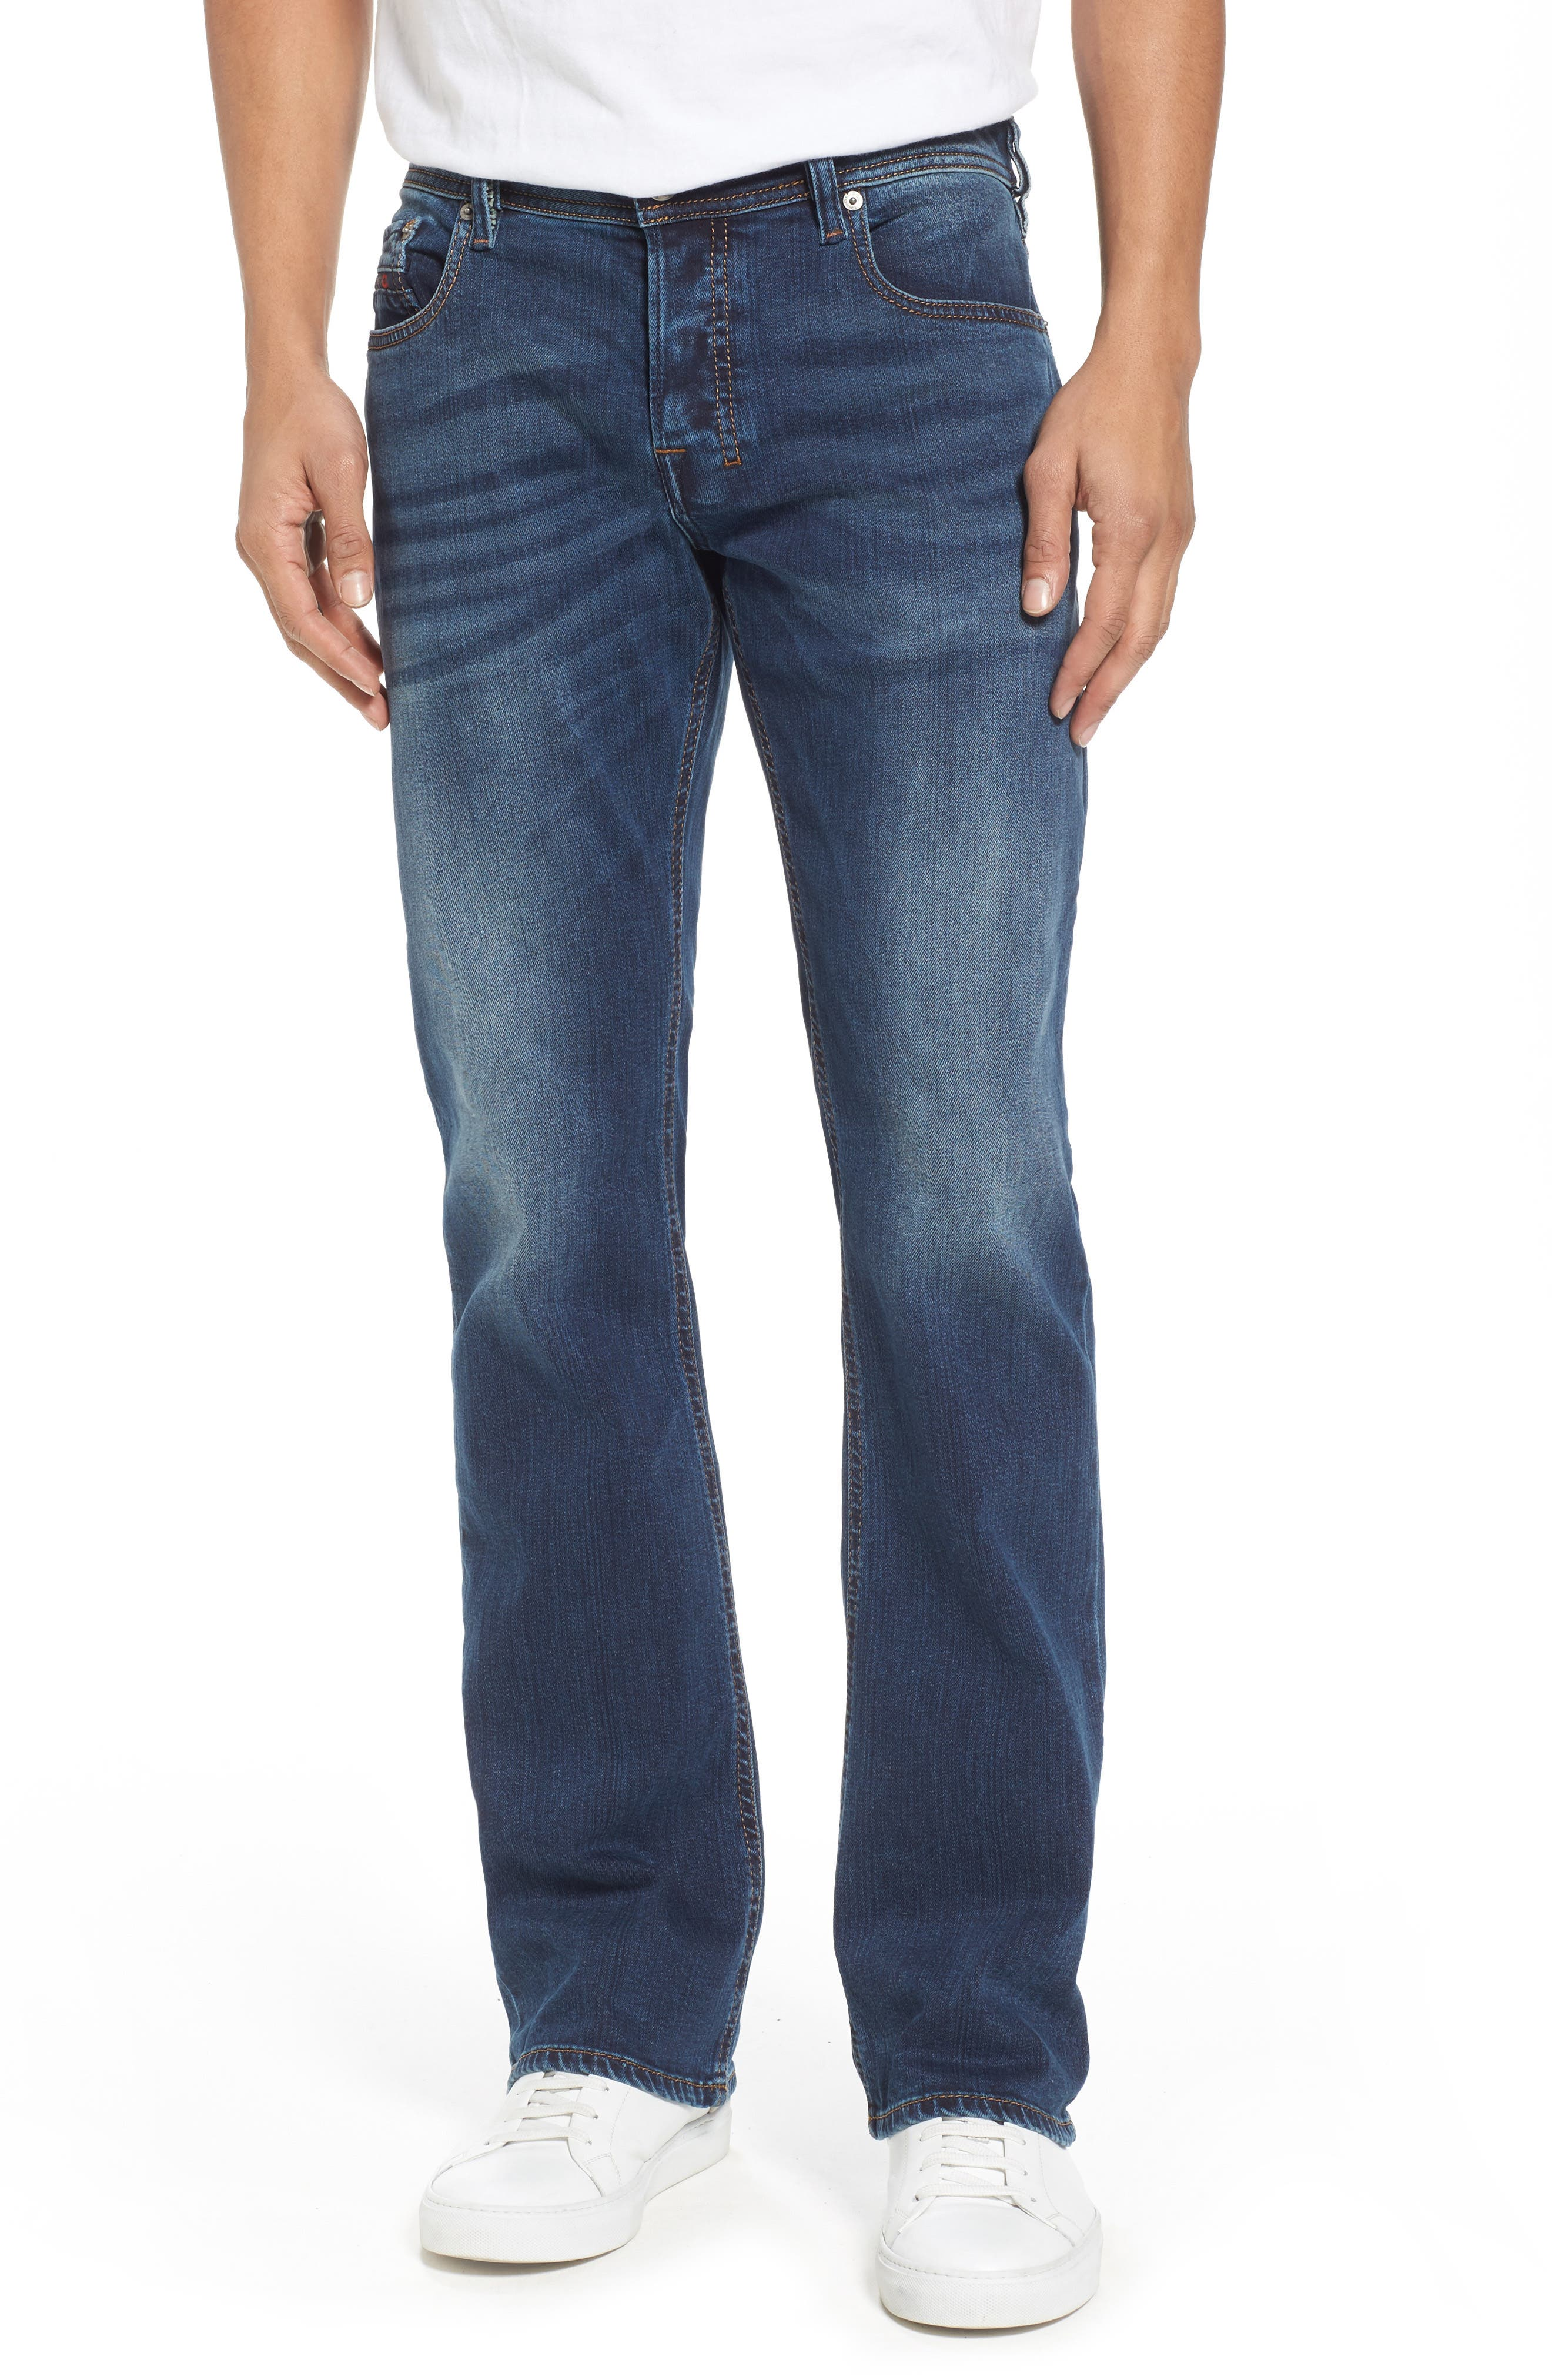 Alternate Image 1 Selected - DIESEL® Zatiny Bootcut Jeans (084BU)